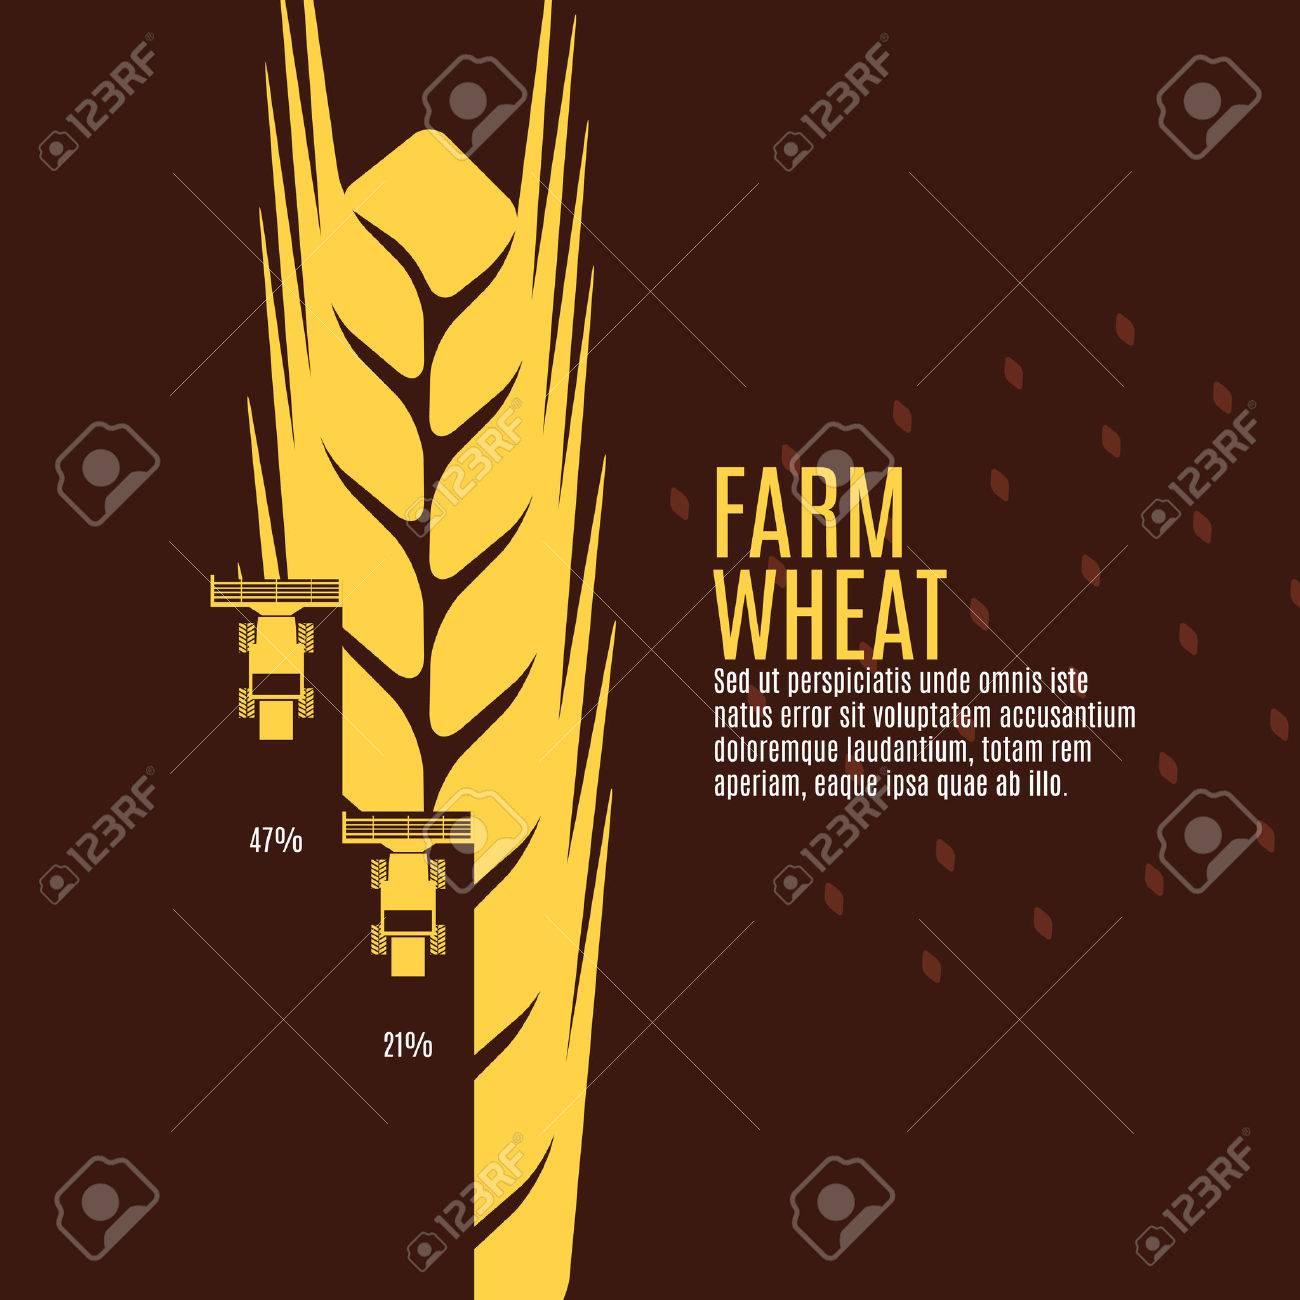 Farm wheat vector illustration - 48804775